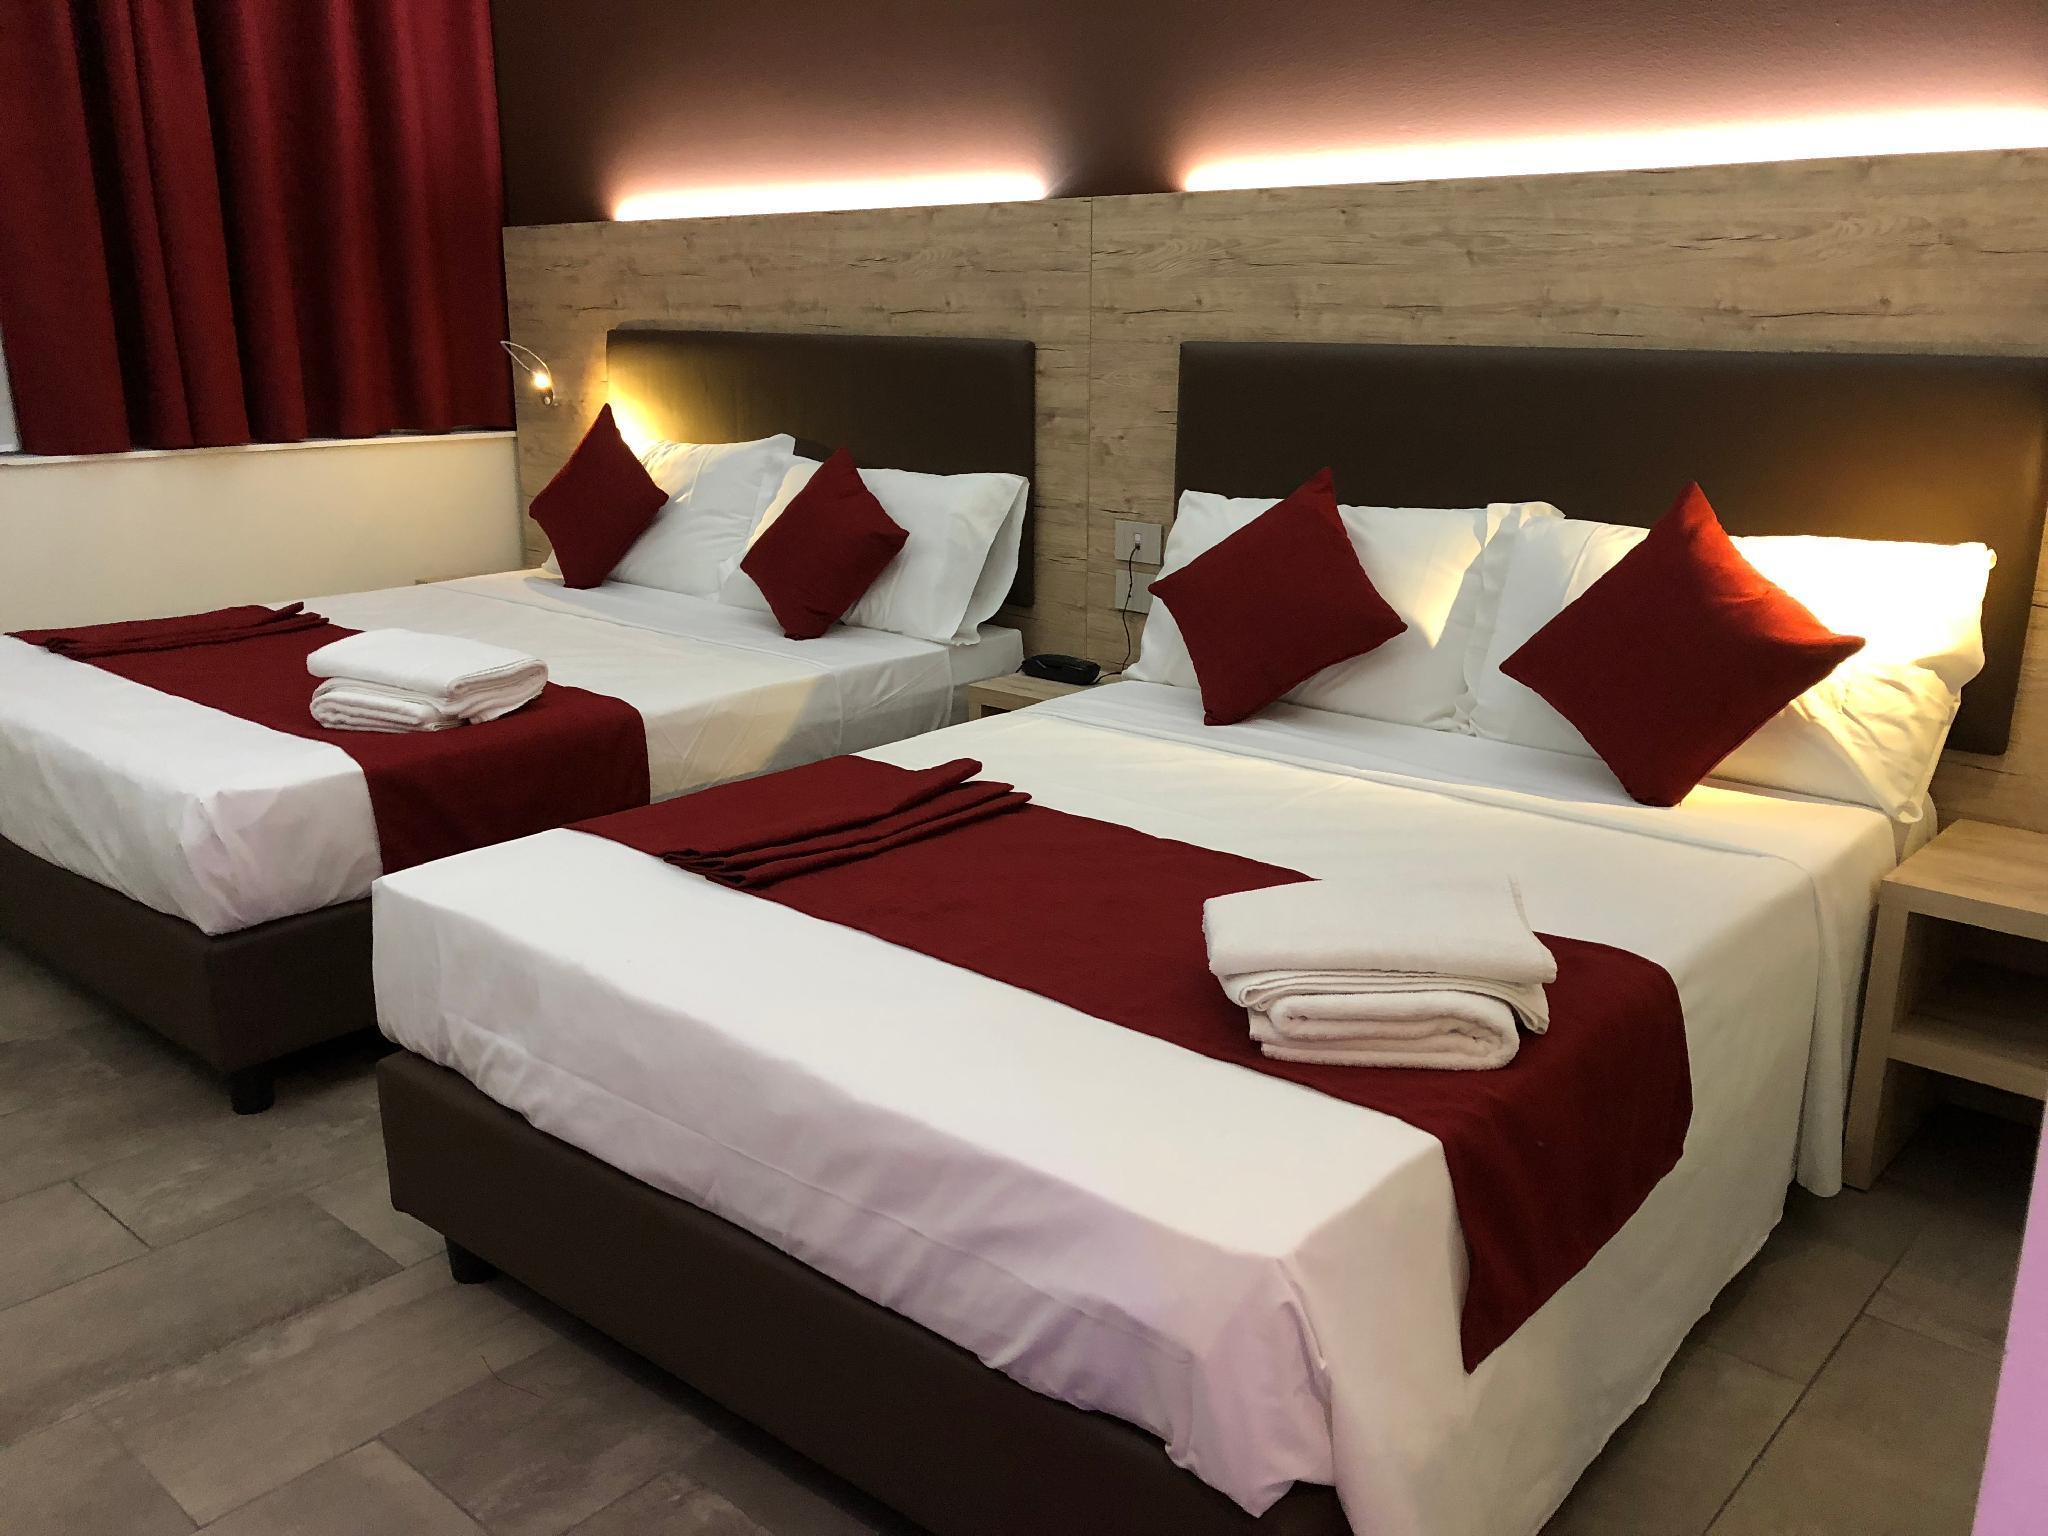 Hotel stradivari-NEW